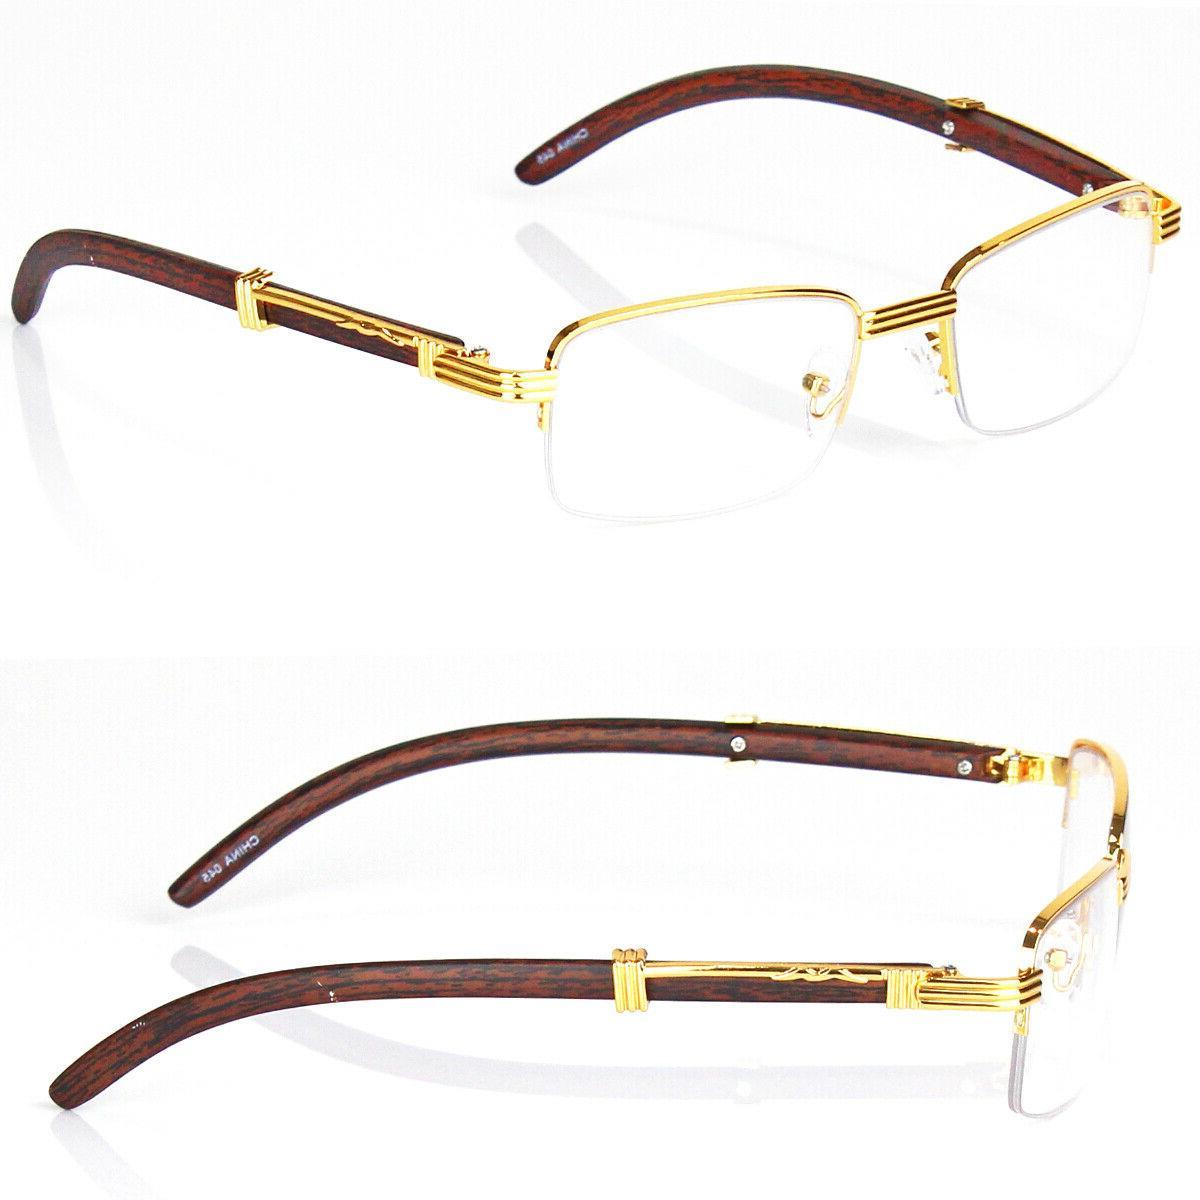 45b8253d5f6 Retro Vintage Clear Lens Gold Wood Frame Fashi